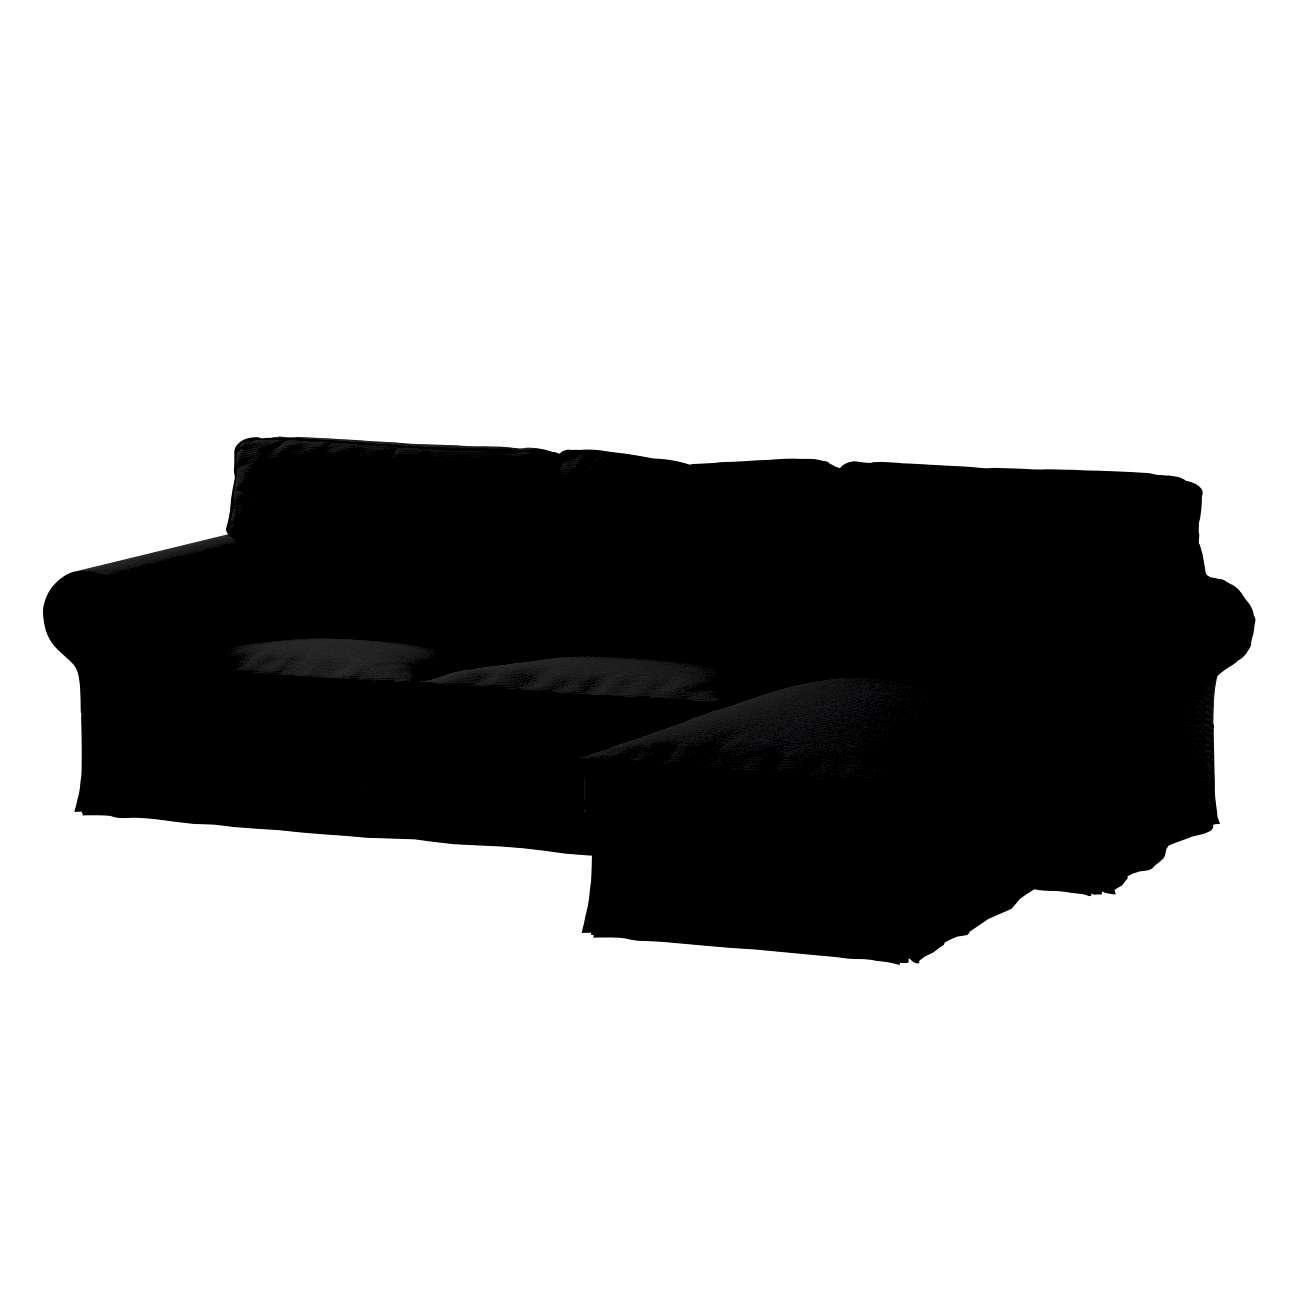 Ektorp 2-Sitzer Sofabezug mit Recamiere Ektorp 2-Sitzer Sofabezug mit Recamiere von der Kollektion Etna, Stoff: 705-00